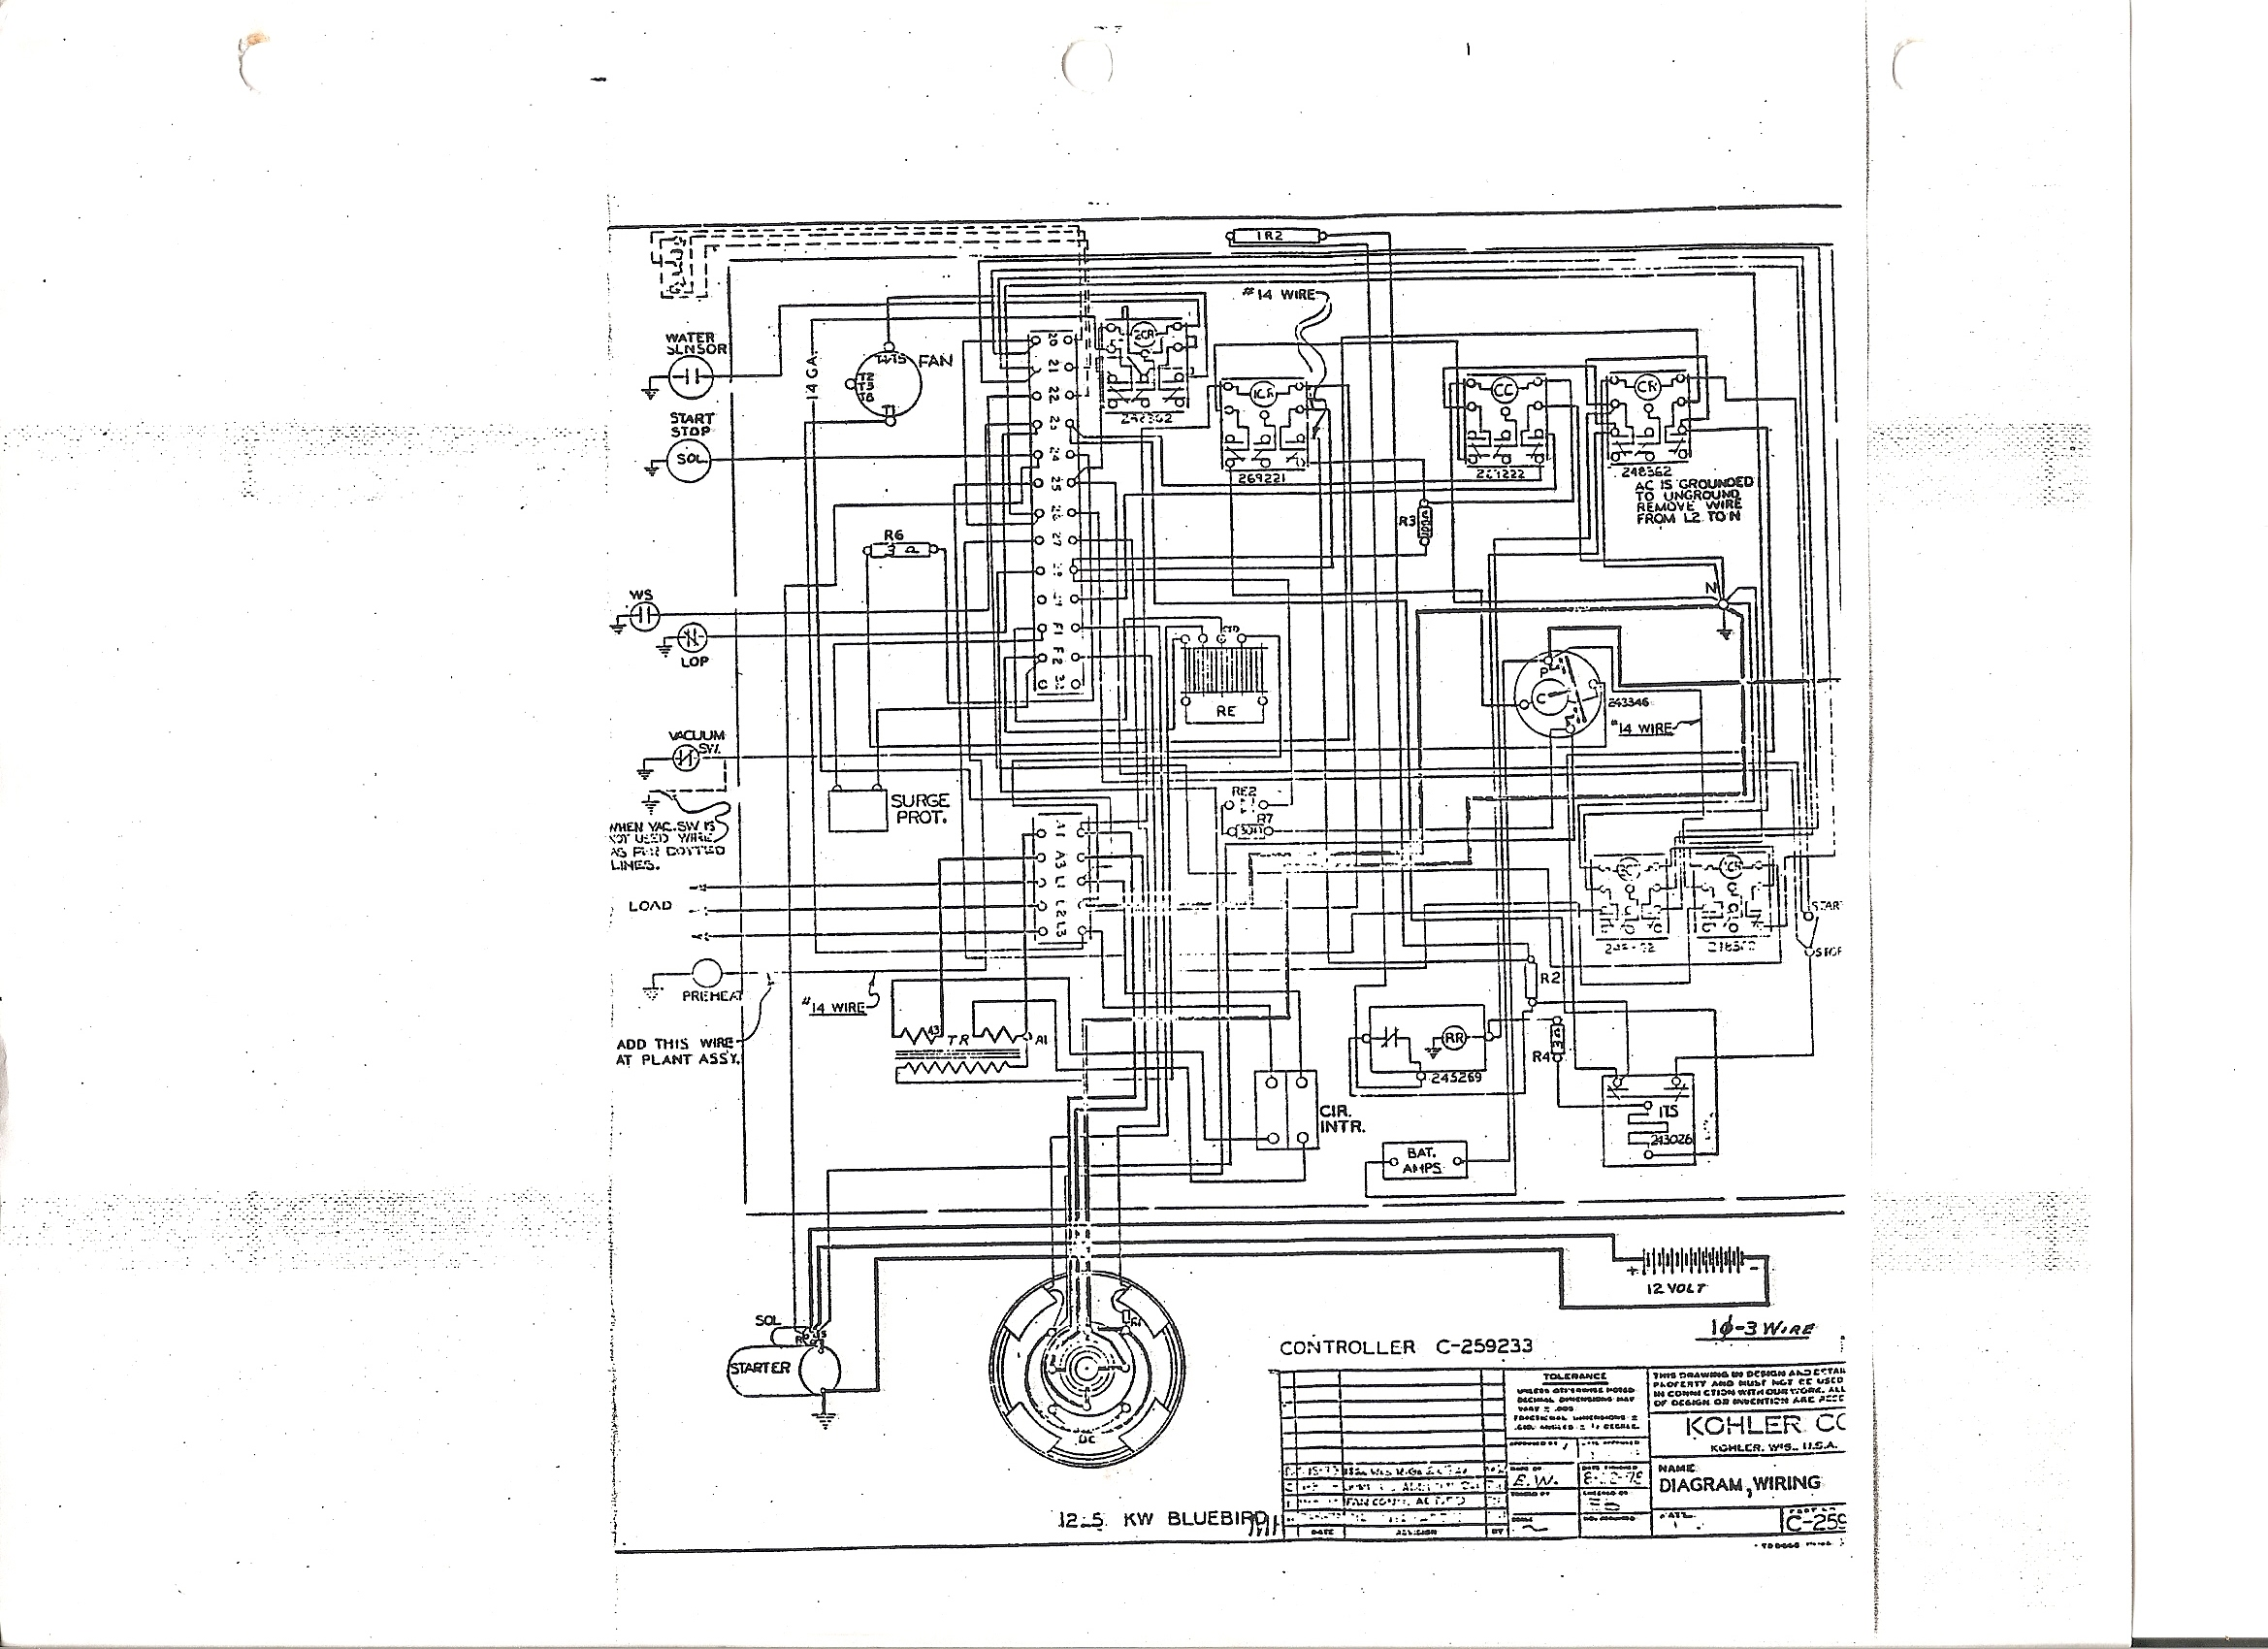 ... Kohler 20 Hp Engine Fuel Pump likewise 6qcln Kohler Ch20s Engine Hobart  Welder Ch ion 10 ...